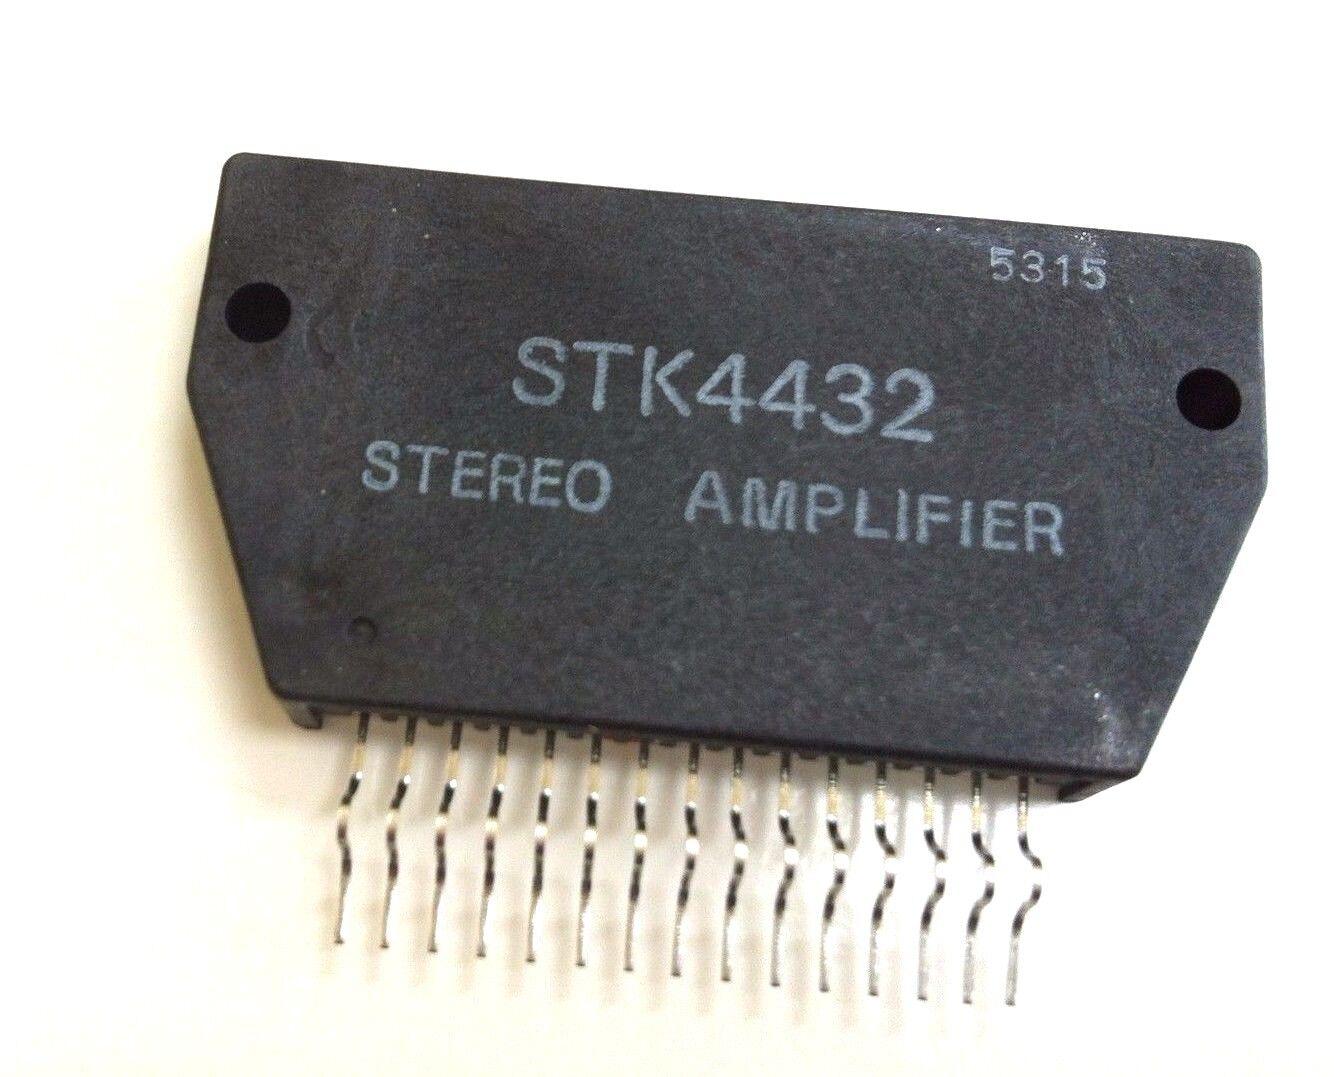 Heat Sink Compound Original SANYO LOT OF 10 STK4044V 2-Ch AF Power Amplifier